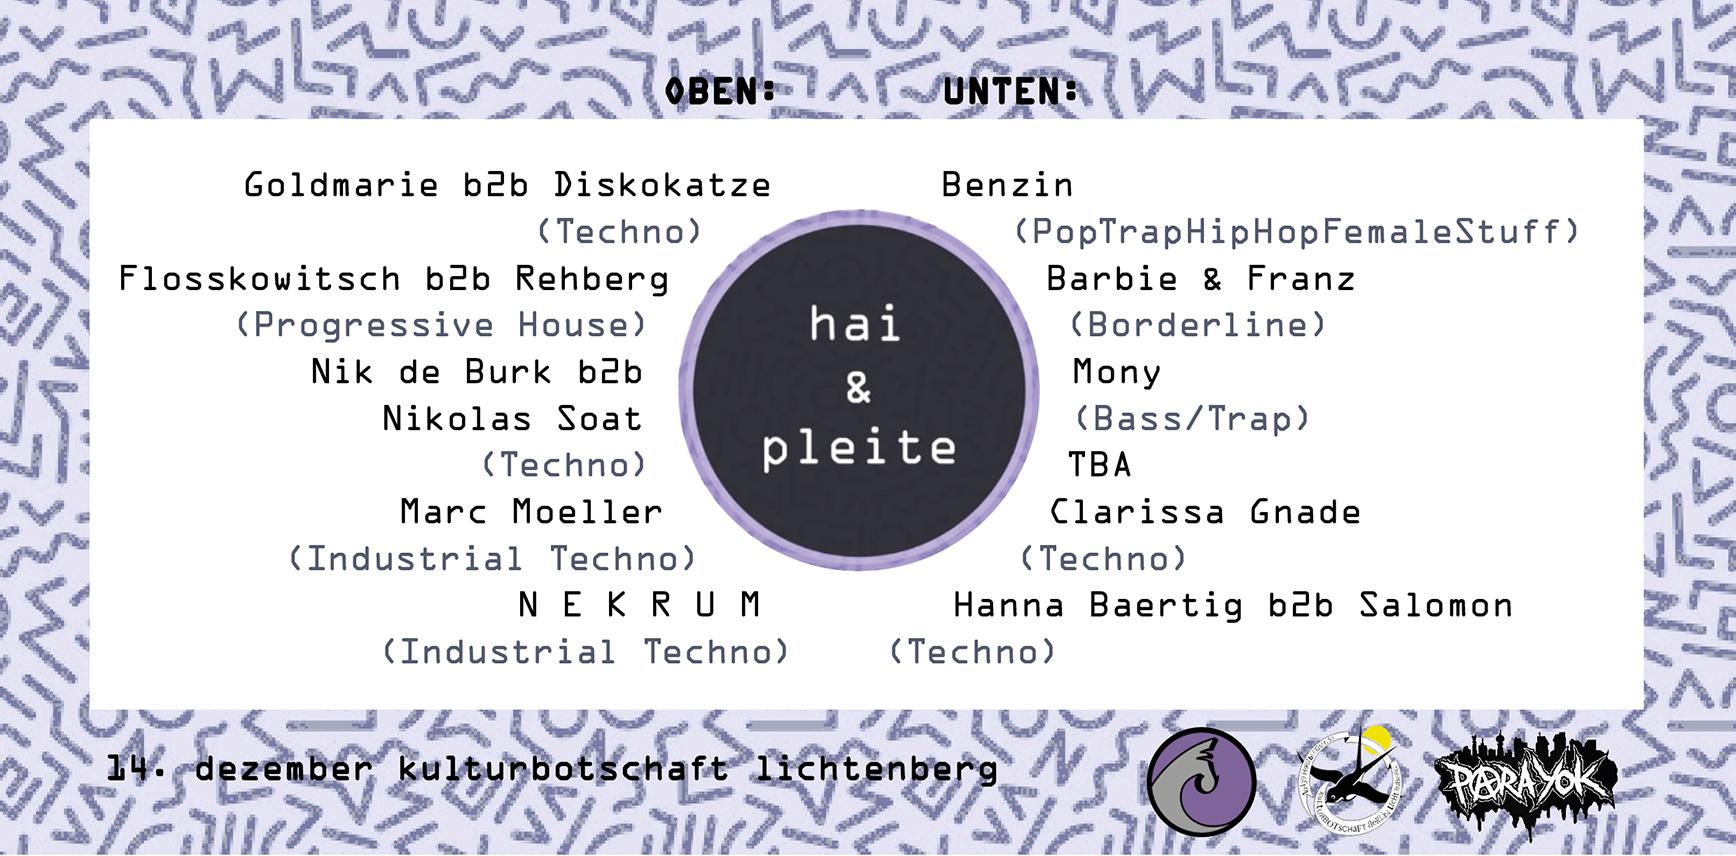 Hai & Pleite Line Up